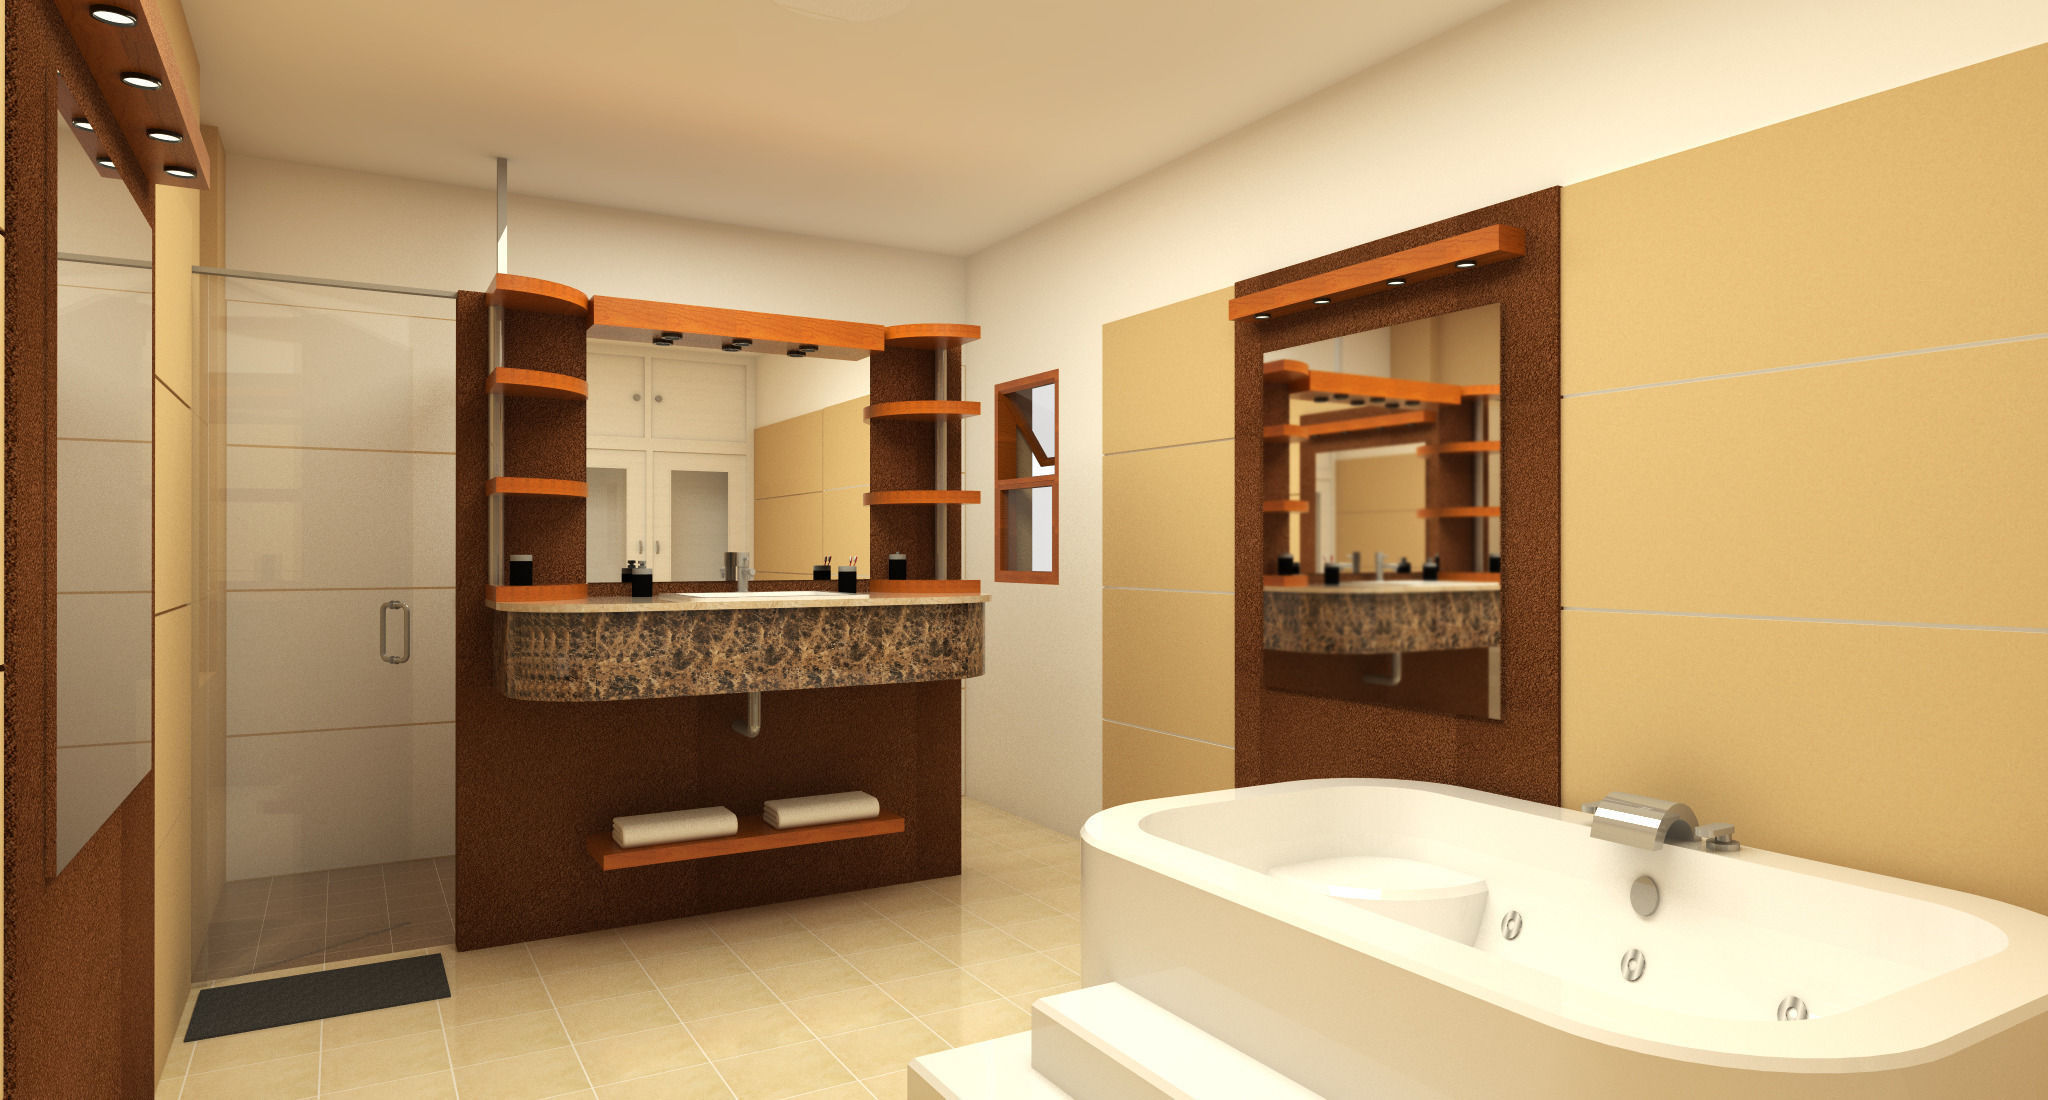 Bathroom Design D Model SKP - 3d bathroom designs